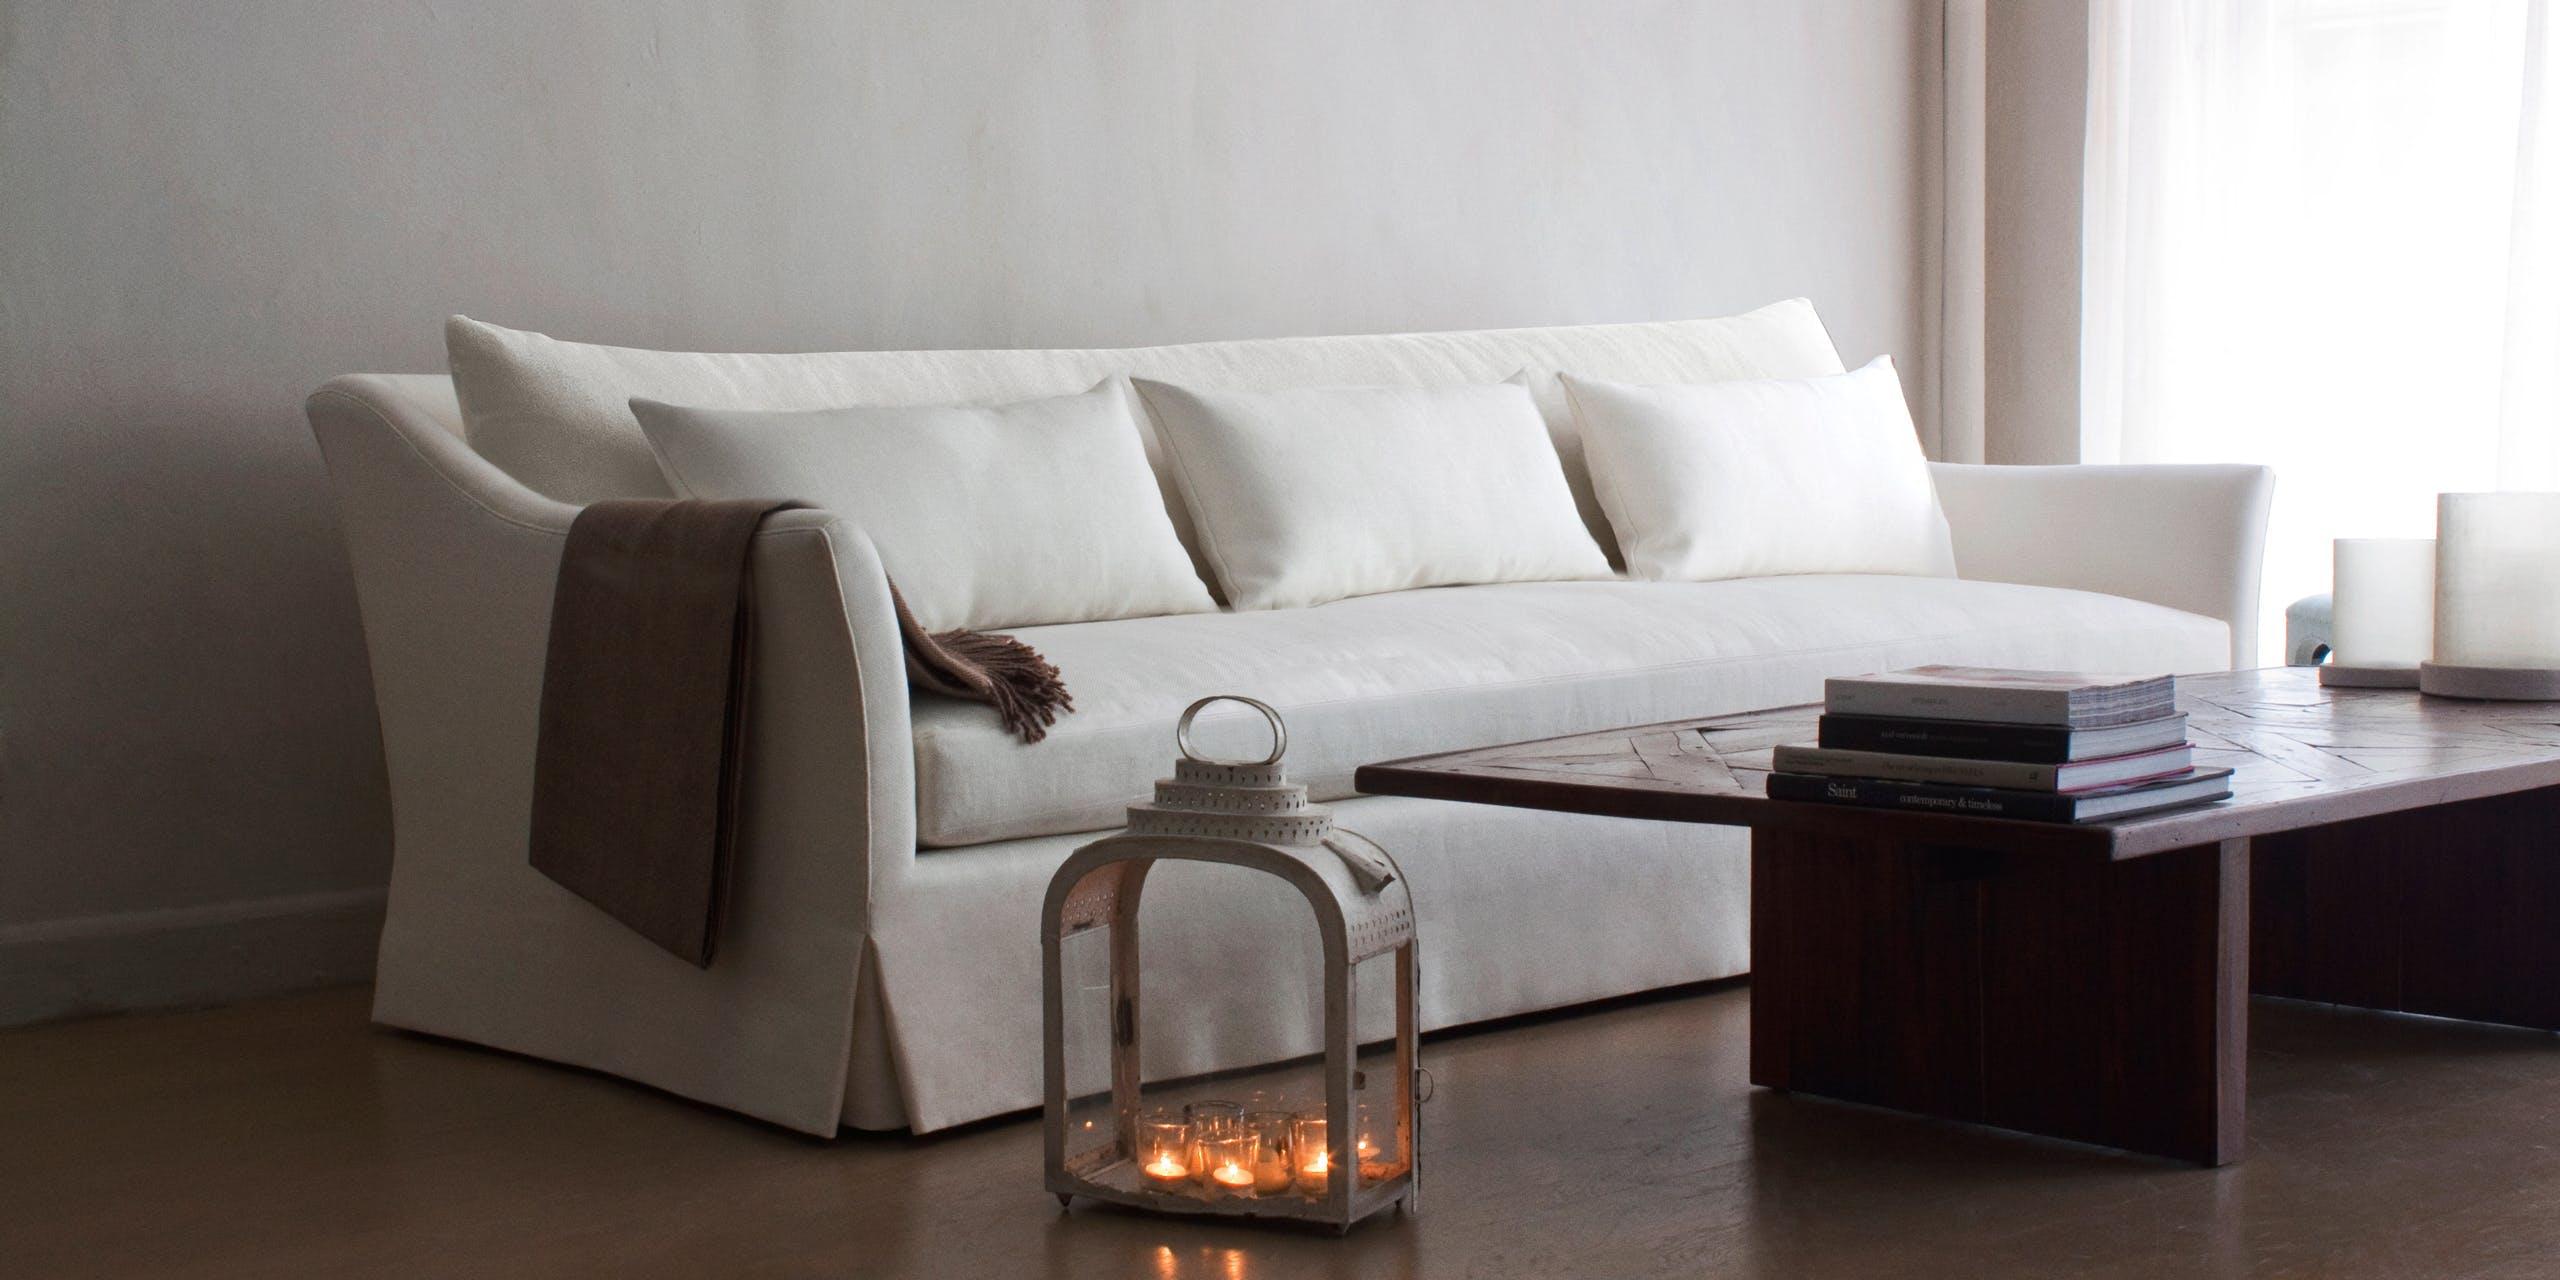 Seine iii sofa main.jpg?ixlib=rails 2.1